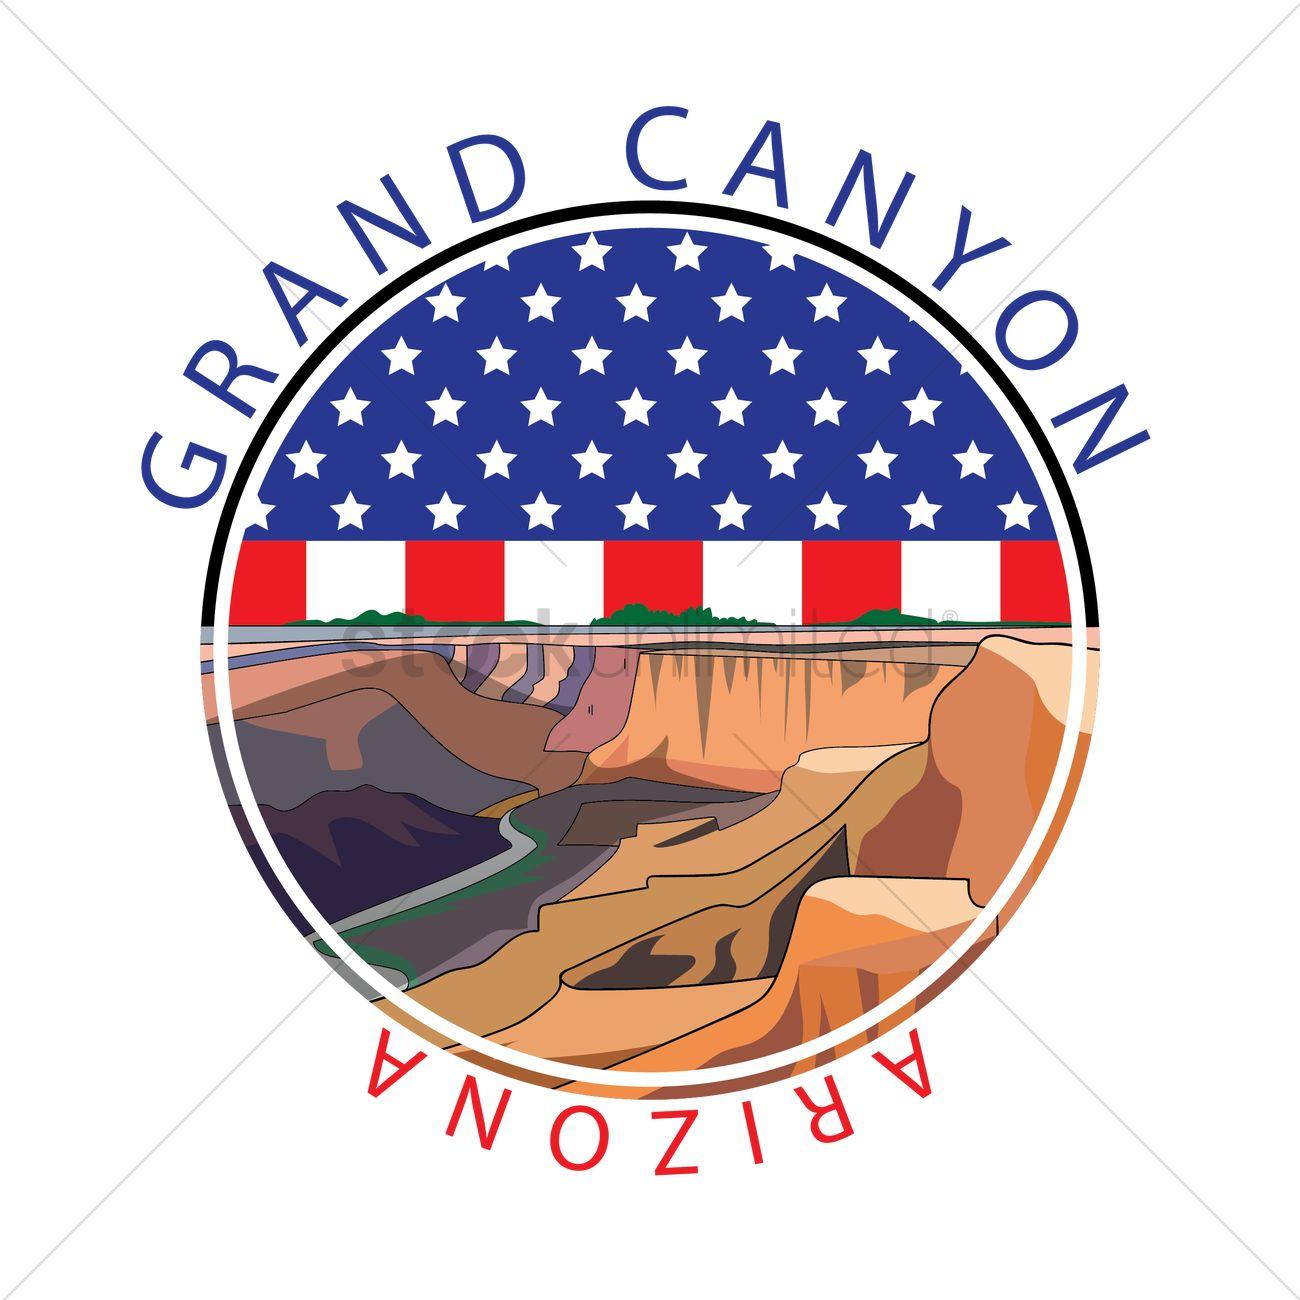 grand canyon vector image 1617766 stockunlimited rh stockunlimited com grand canyon university clipart Grand Canyon Drawing